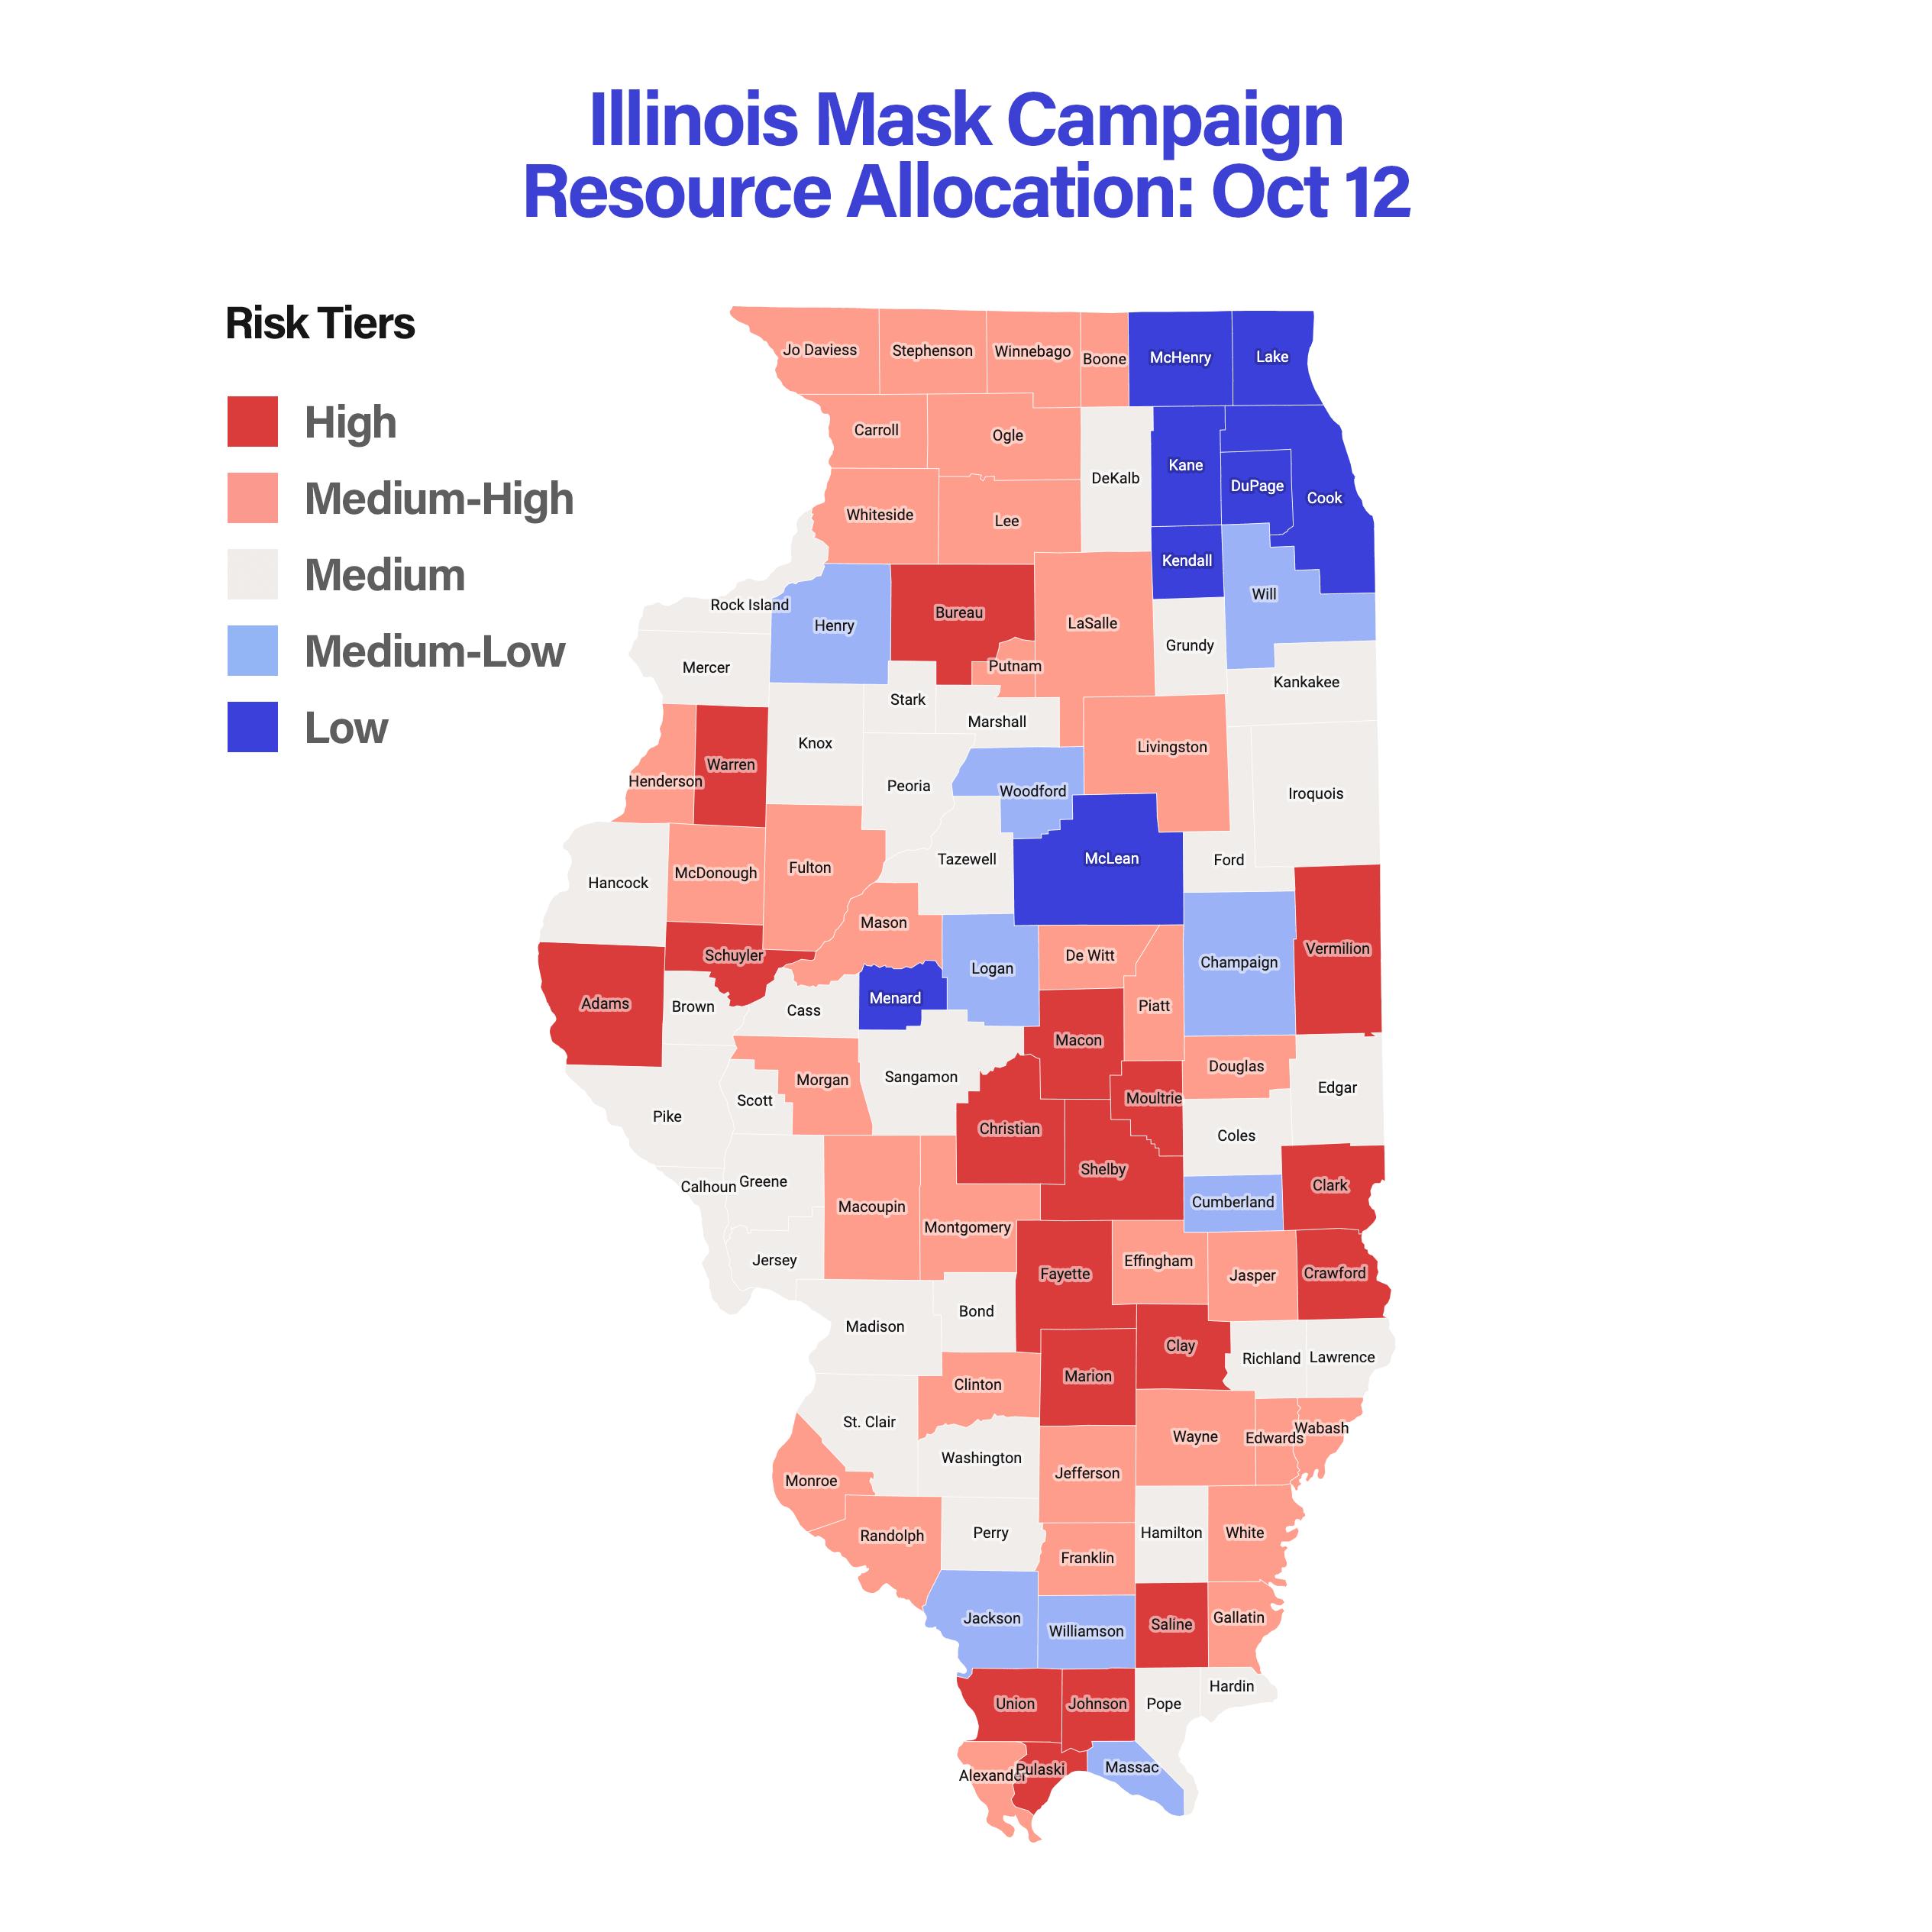 Illinois Mask Campaign Resource Allocation: Oct 12